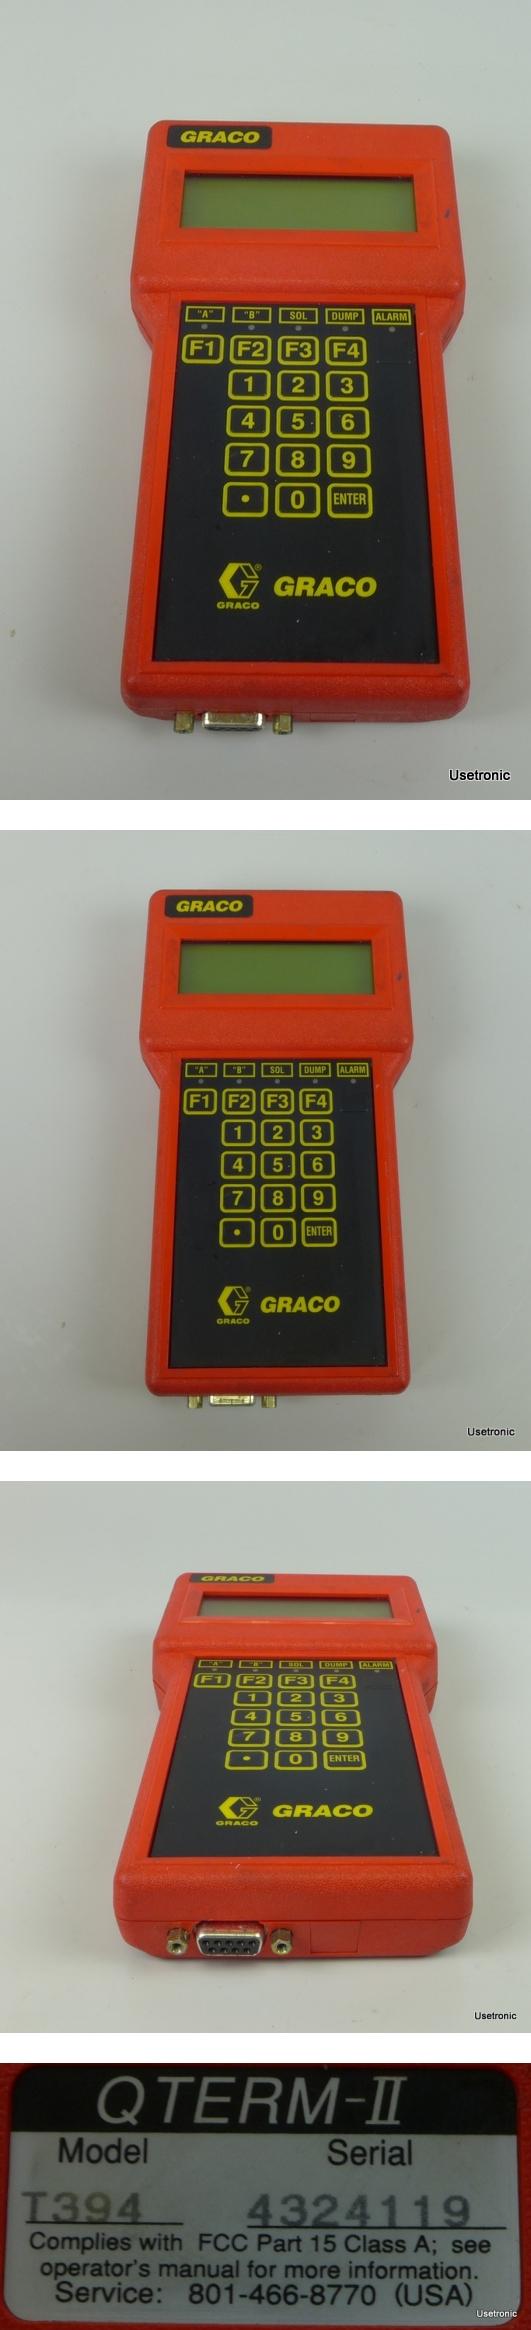 Graco Q Term II T394